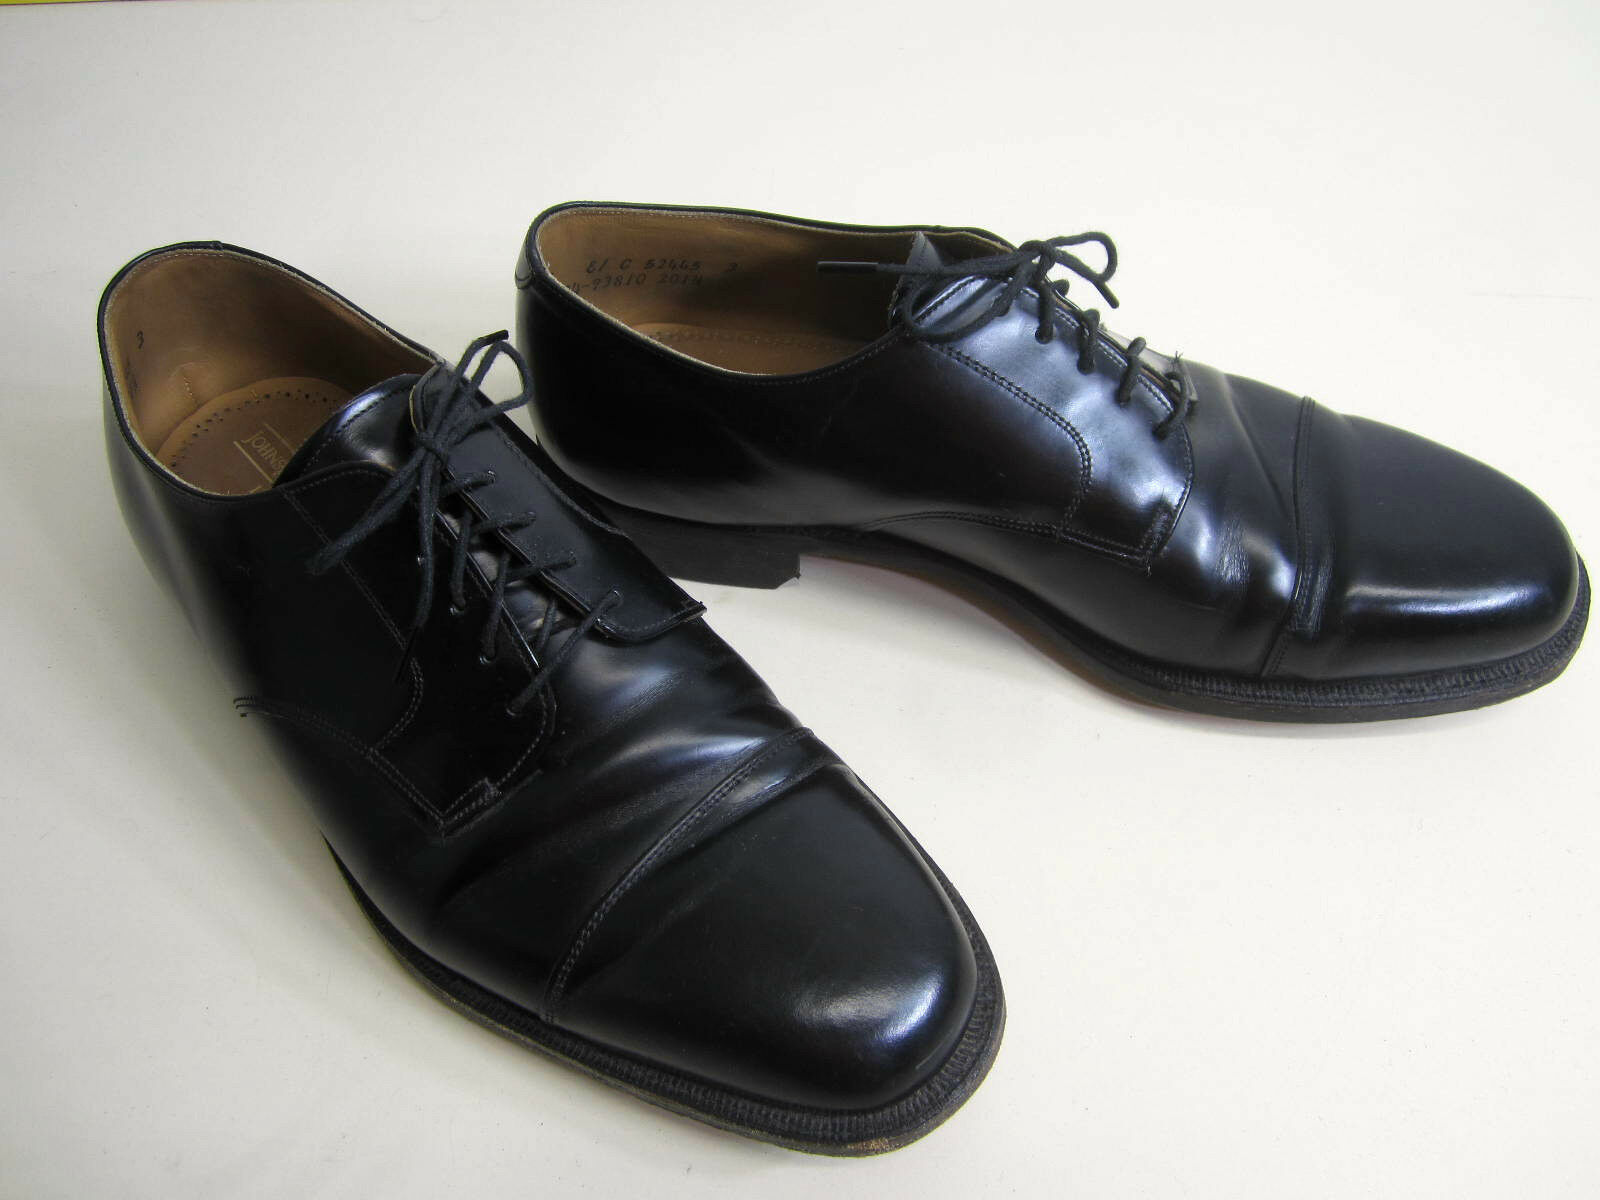 VTG Johnston & Murphy Limitada Oxford Zapatos de vestir de la puntera De Cuero Negro 10e Usa